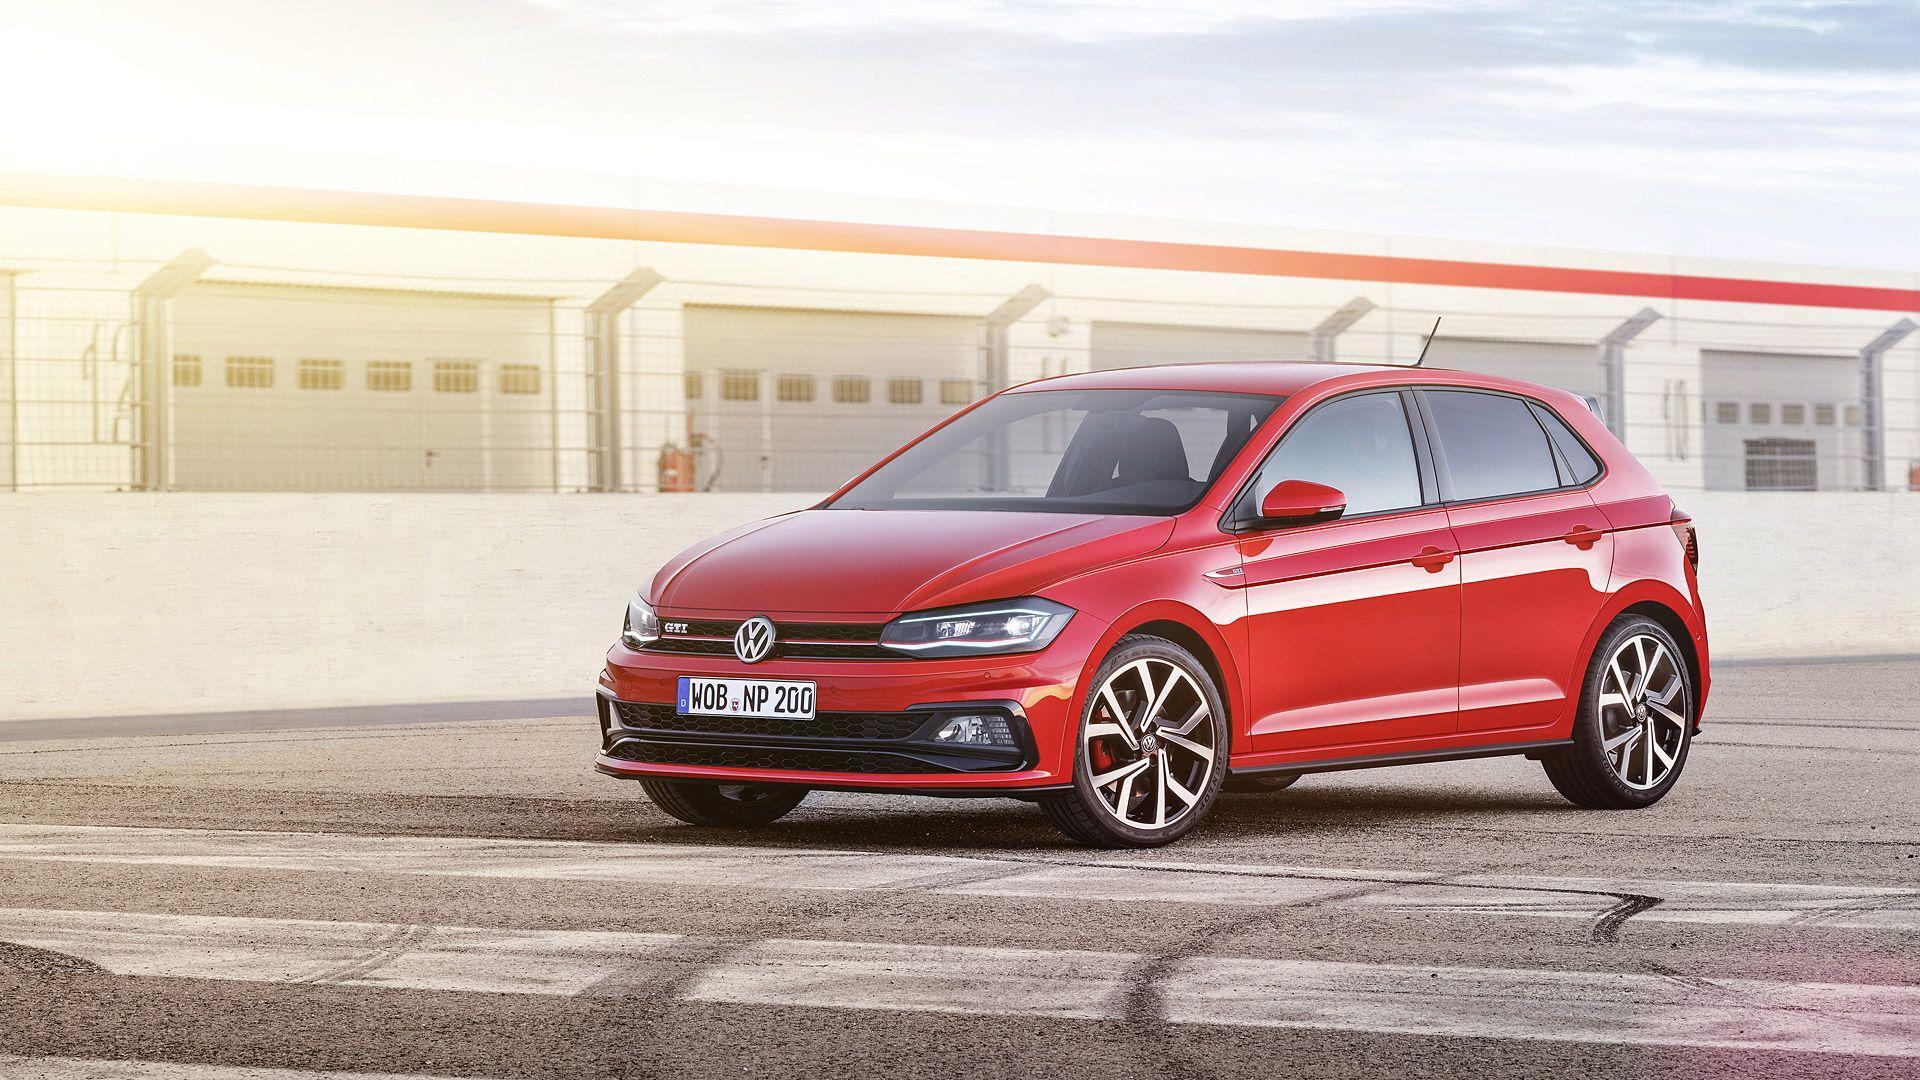 Volkswagen Polo Gti Wallpapers Top Free Volkswagen Polo Gti Backgrounds Wallpaperaccess